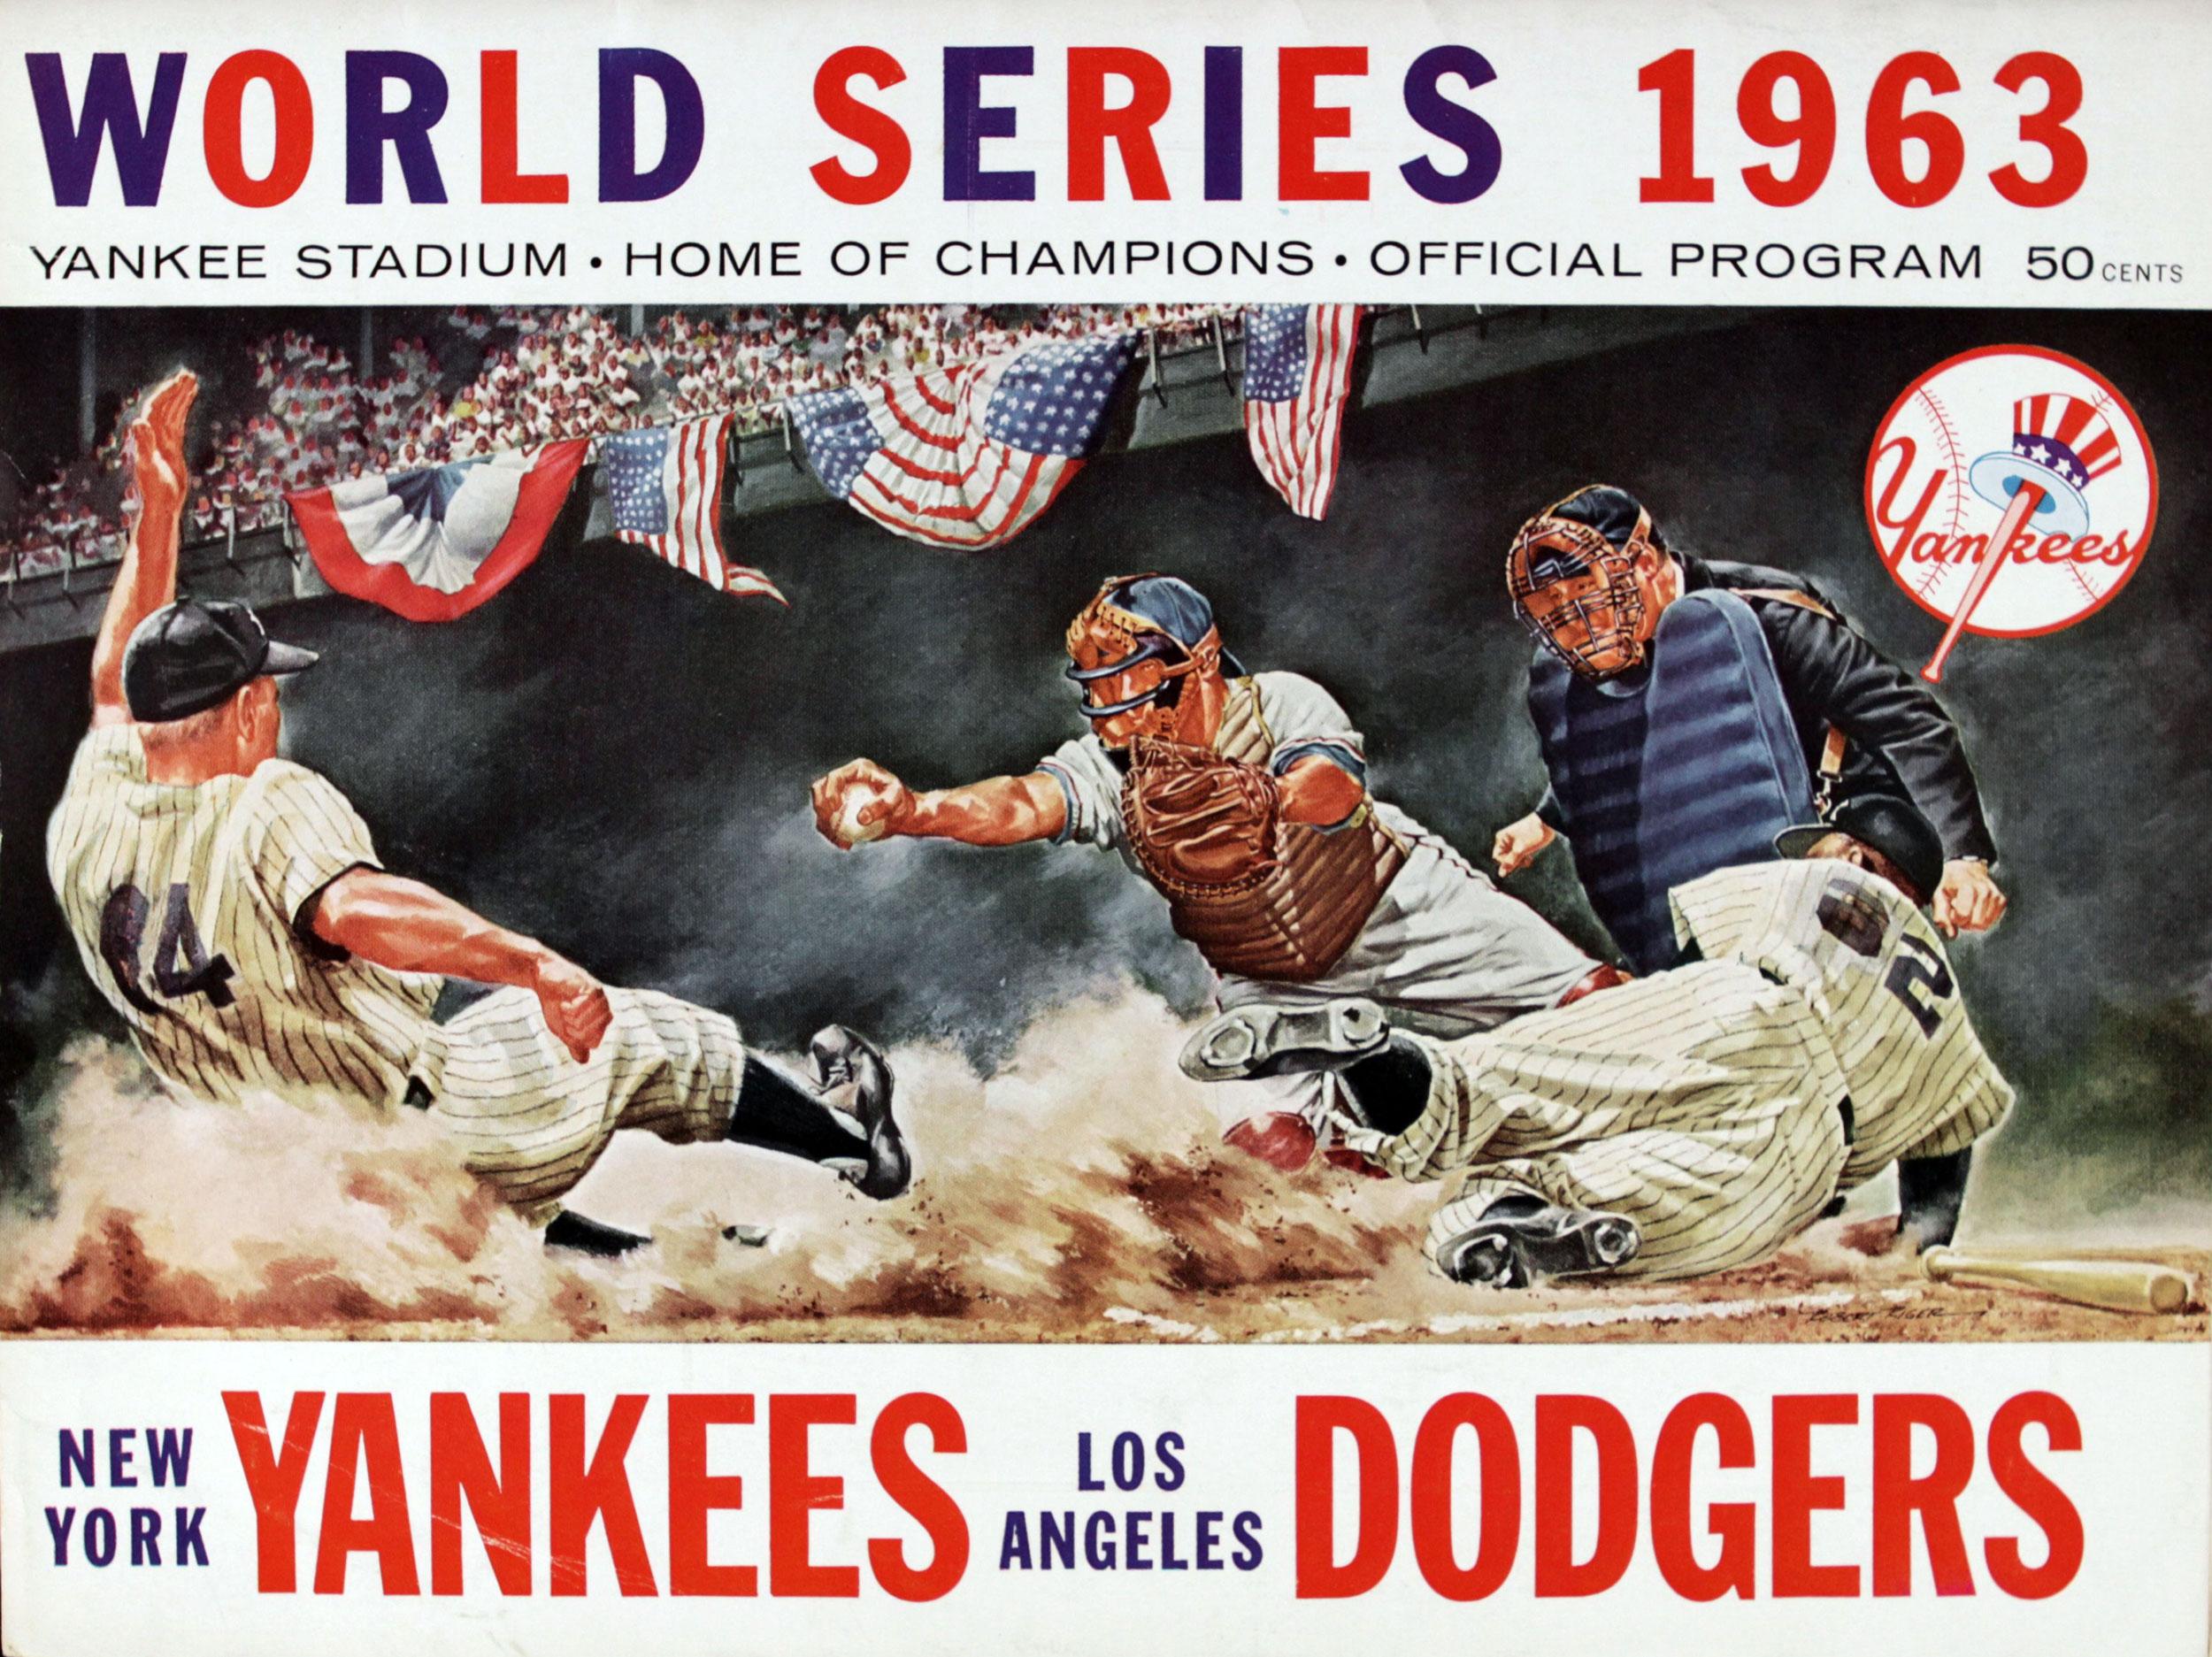 1963-world-series-program.jpg